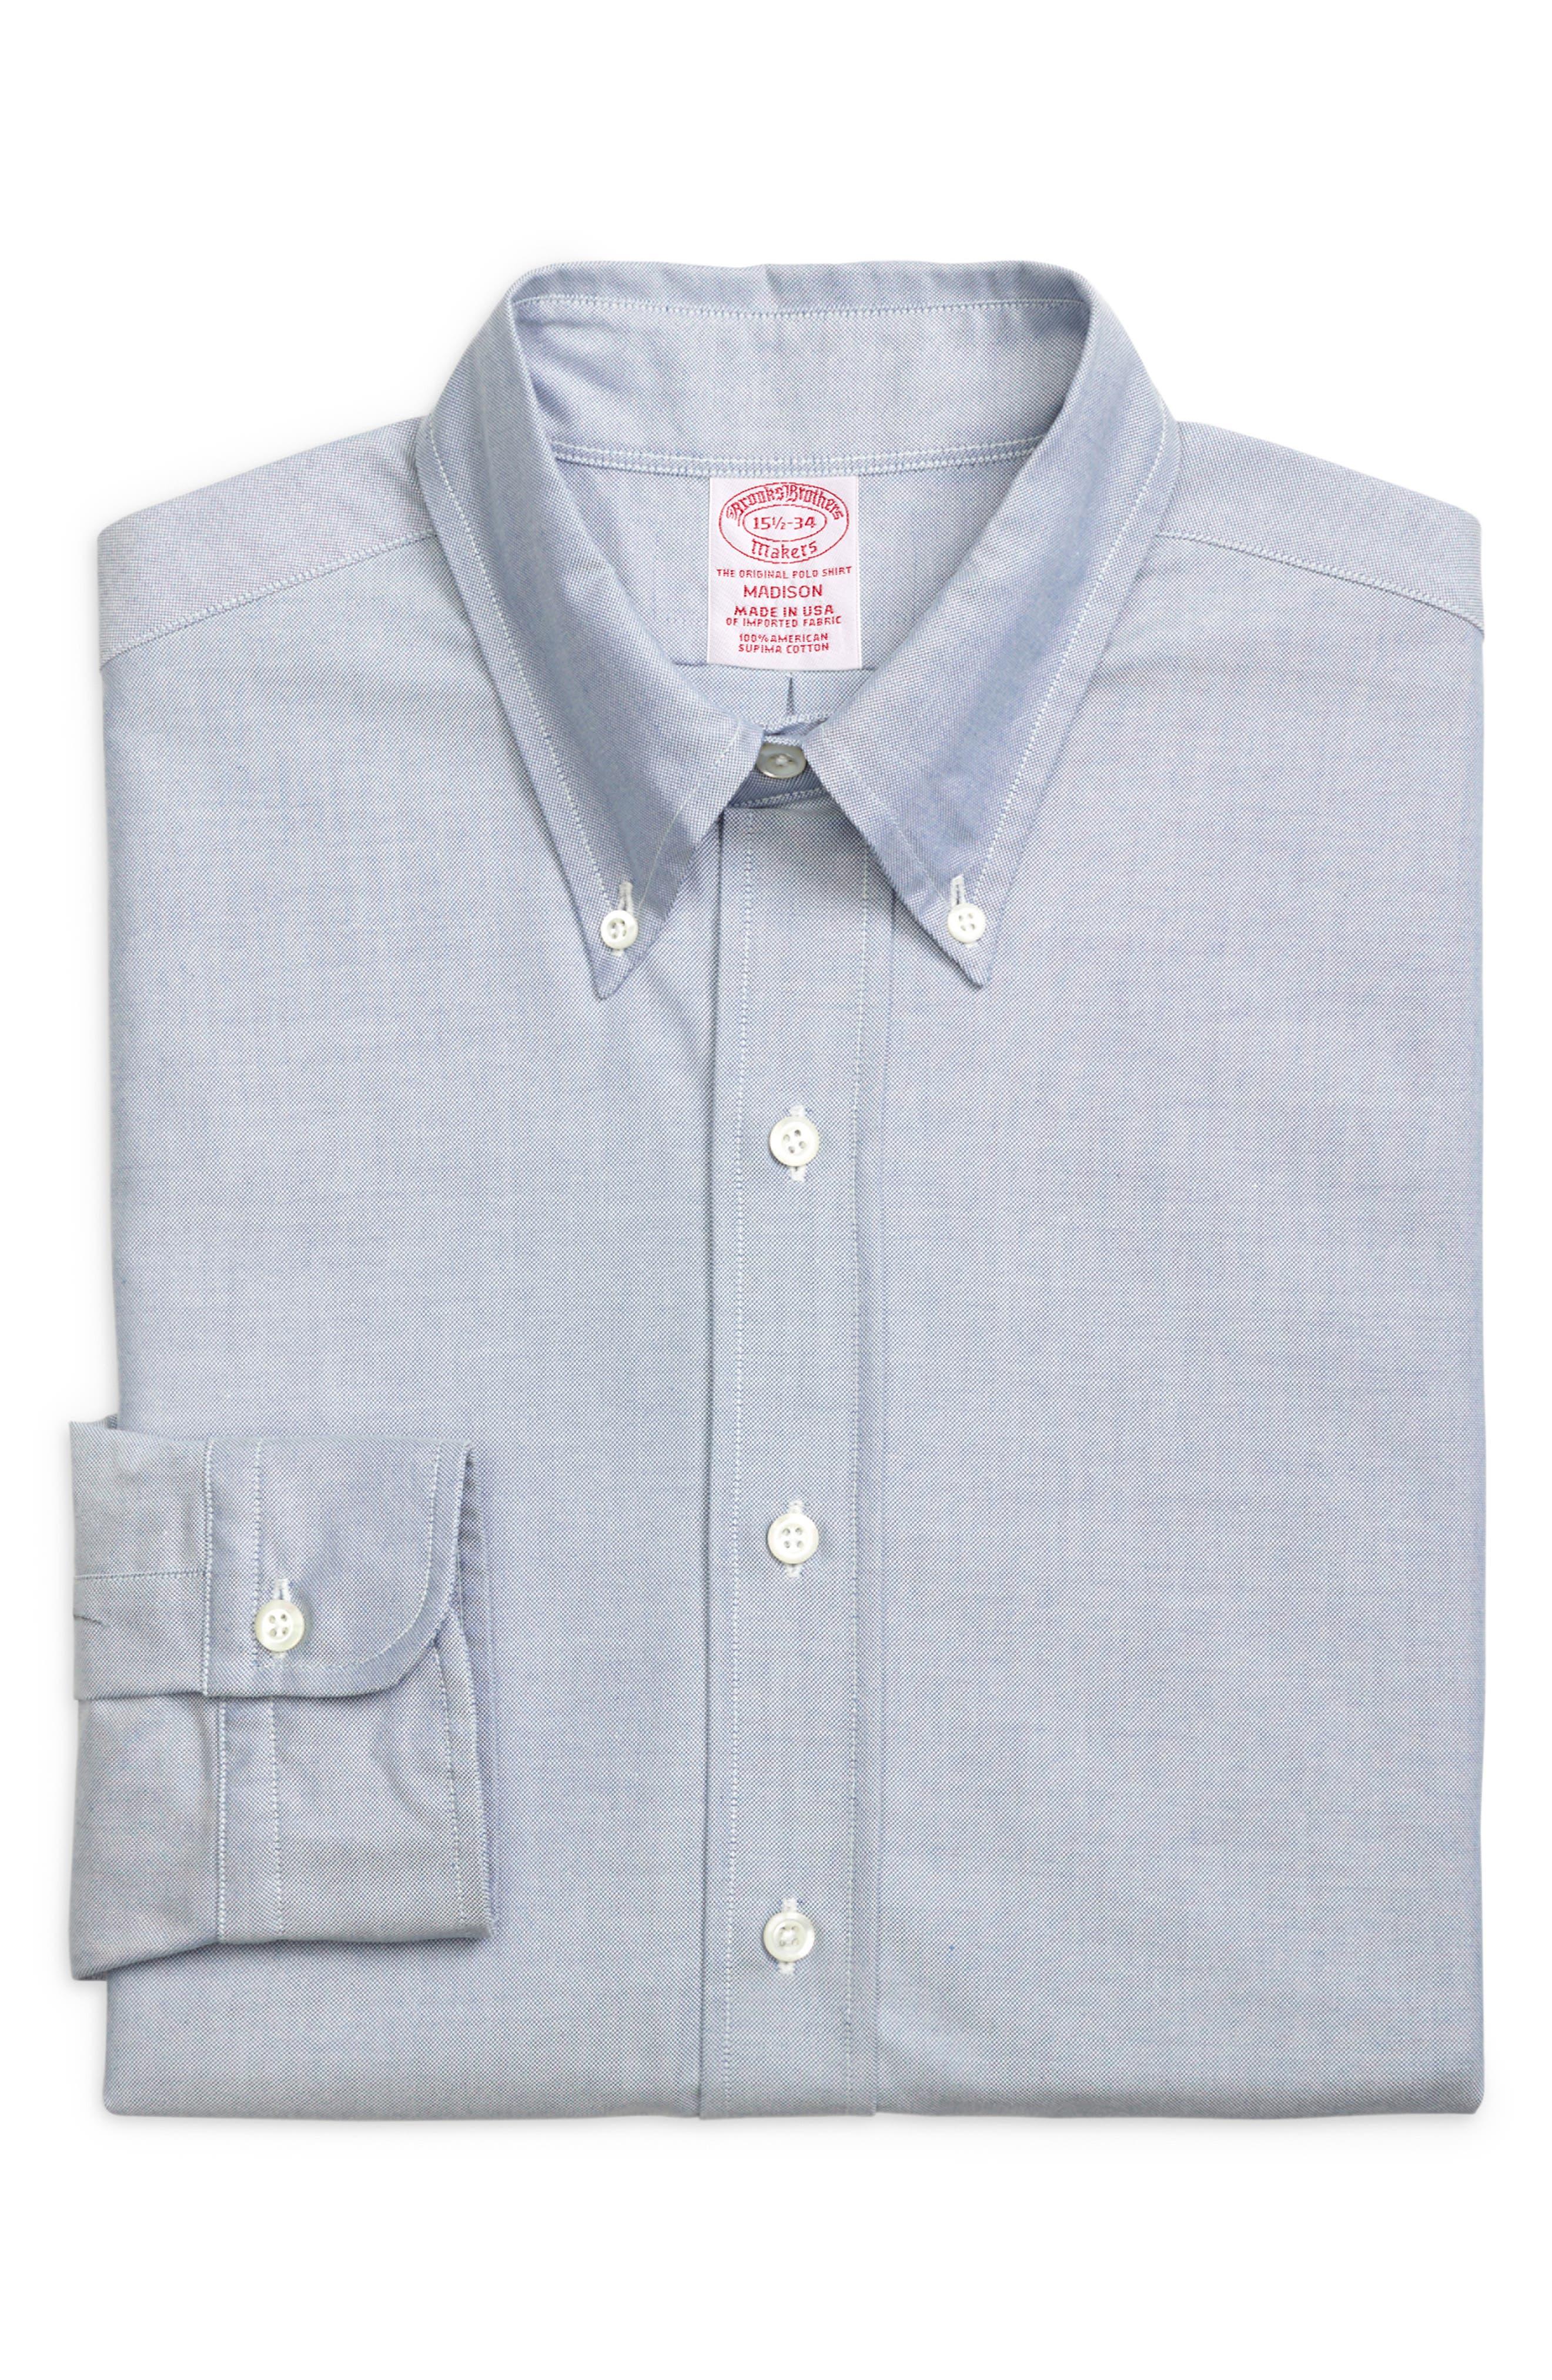 Madison Classic Fit Solid Dress Shirt